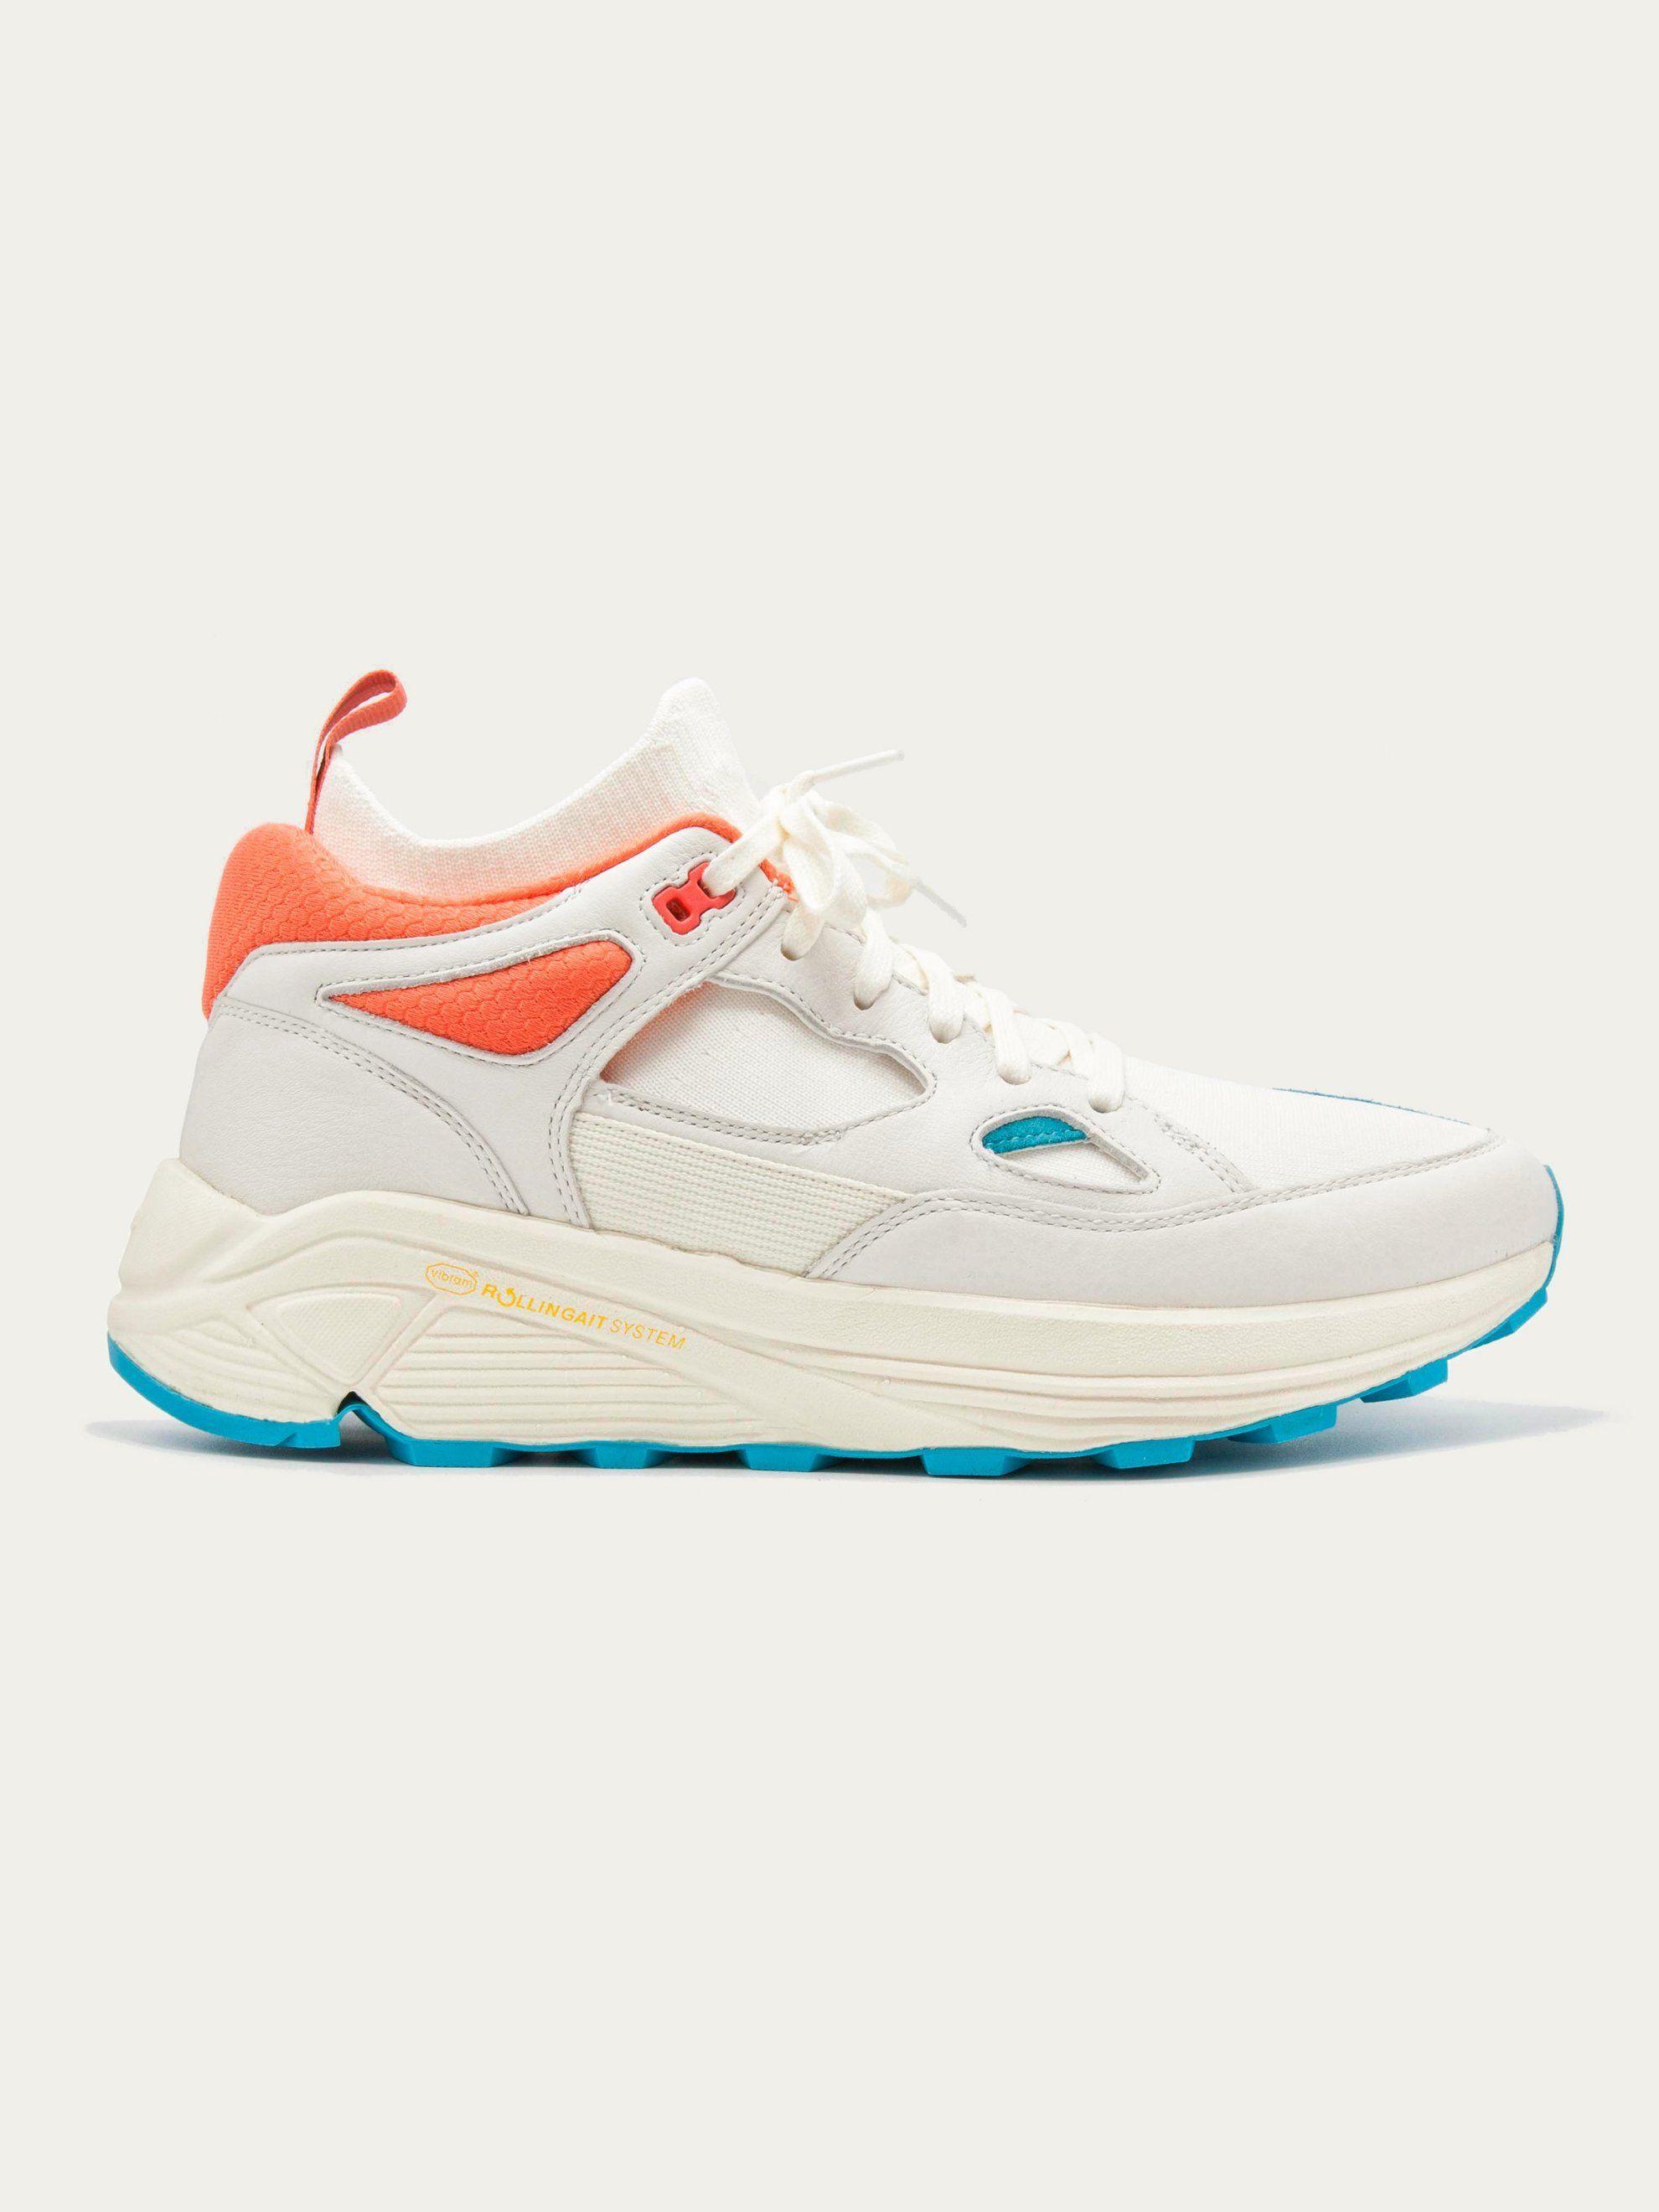 promo code 65408 95bbf BRANDBLACK - Aura WhiteAqua Sneakers - 200.00